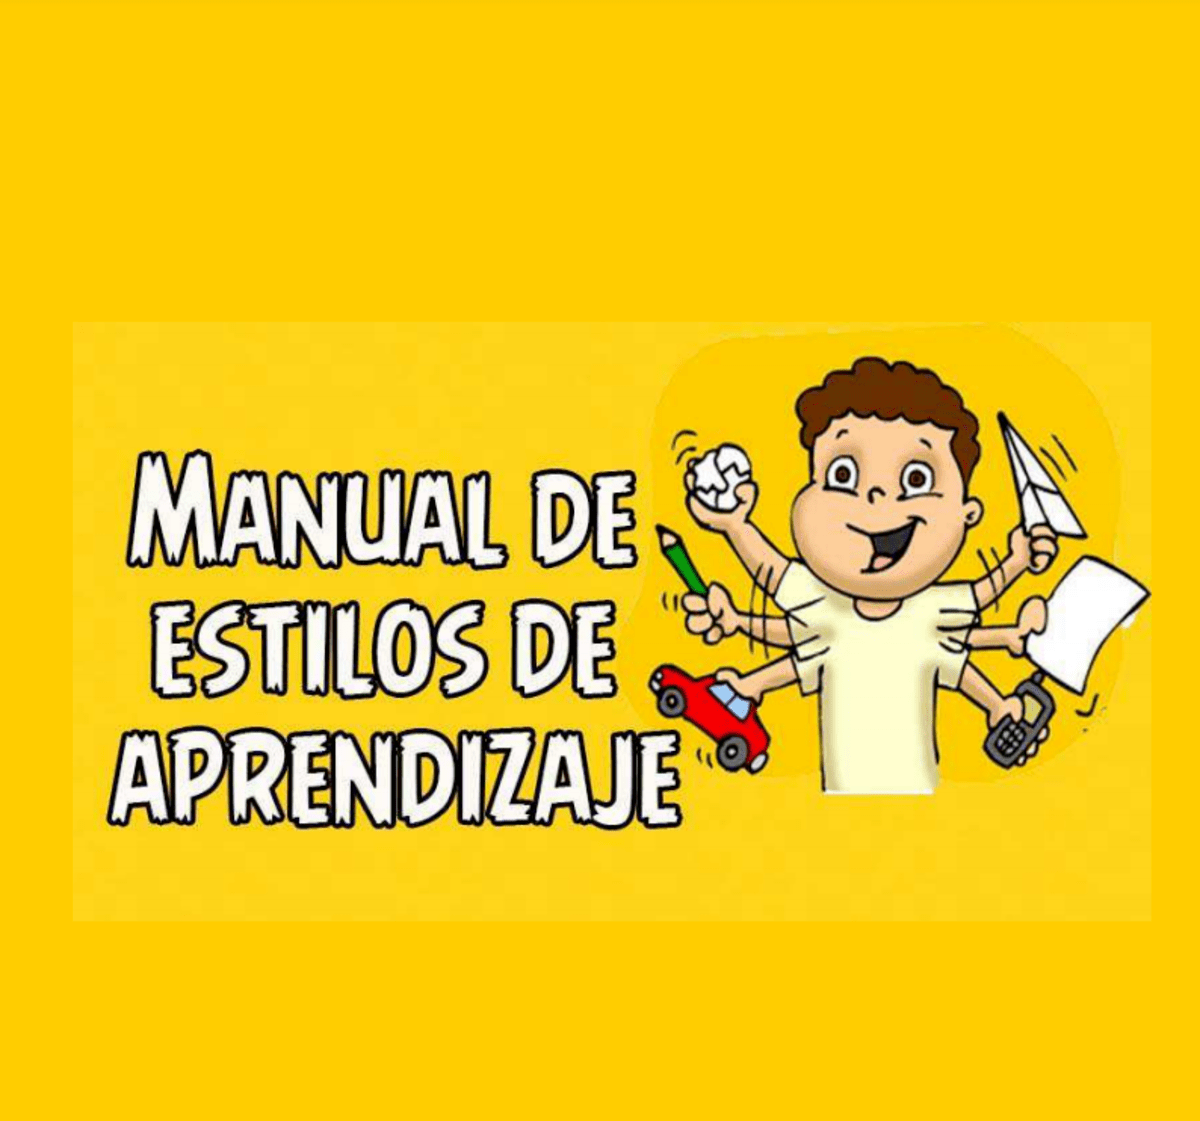 Manual de Estilos de Estilos de Aprendizaje.